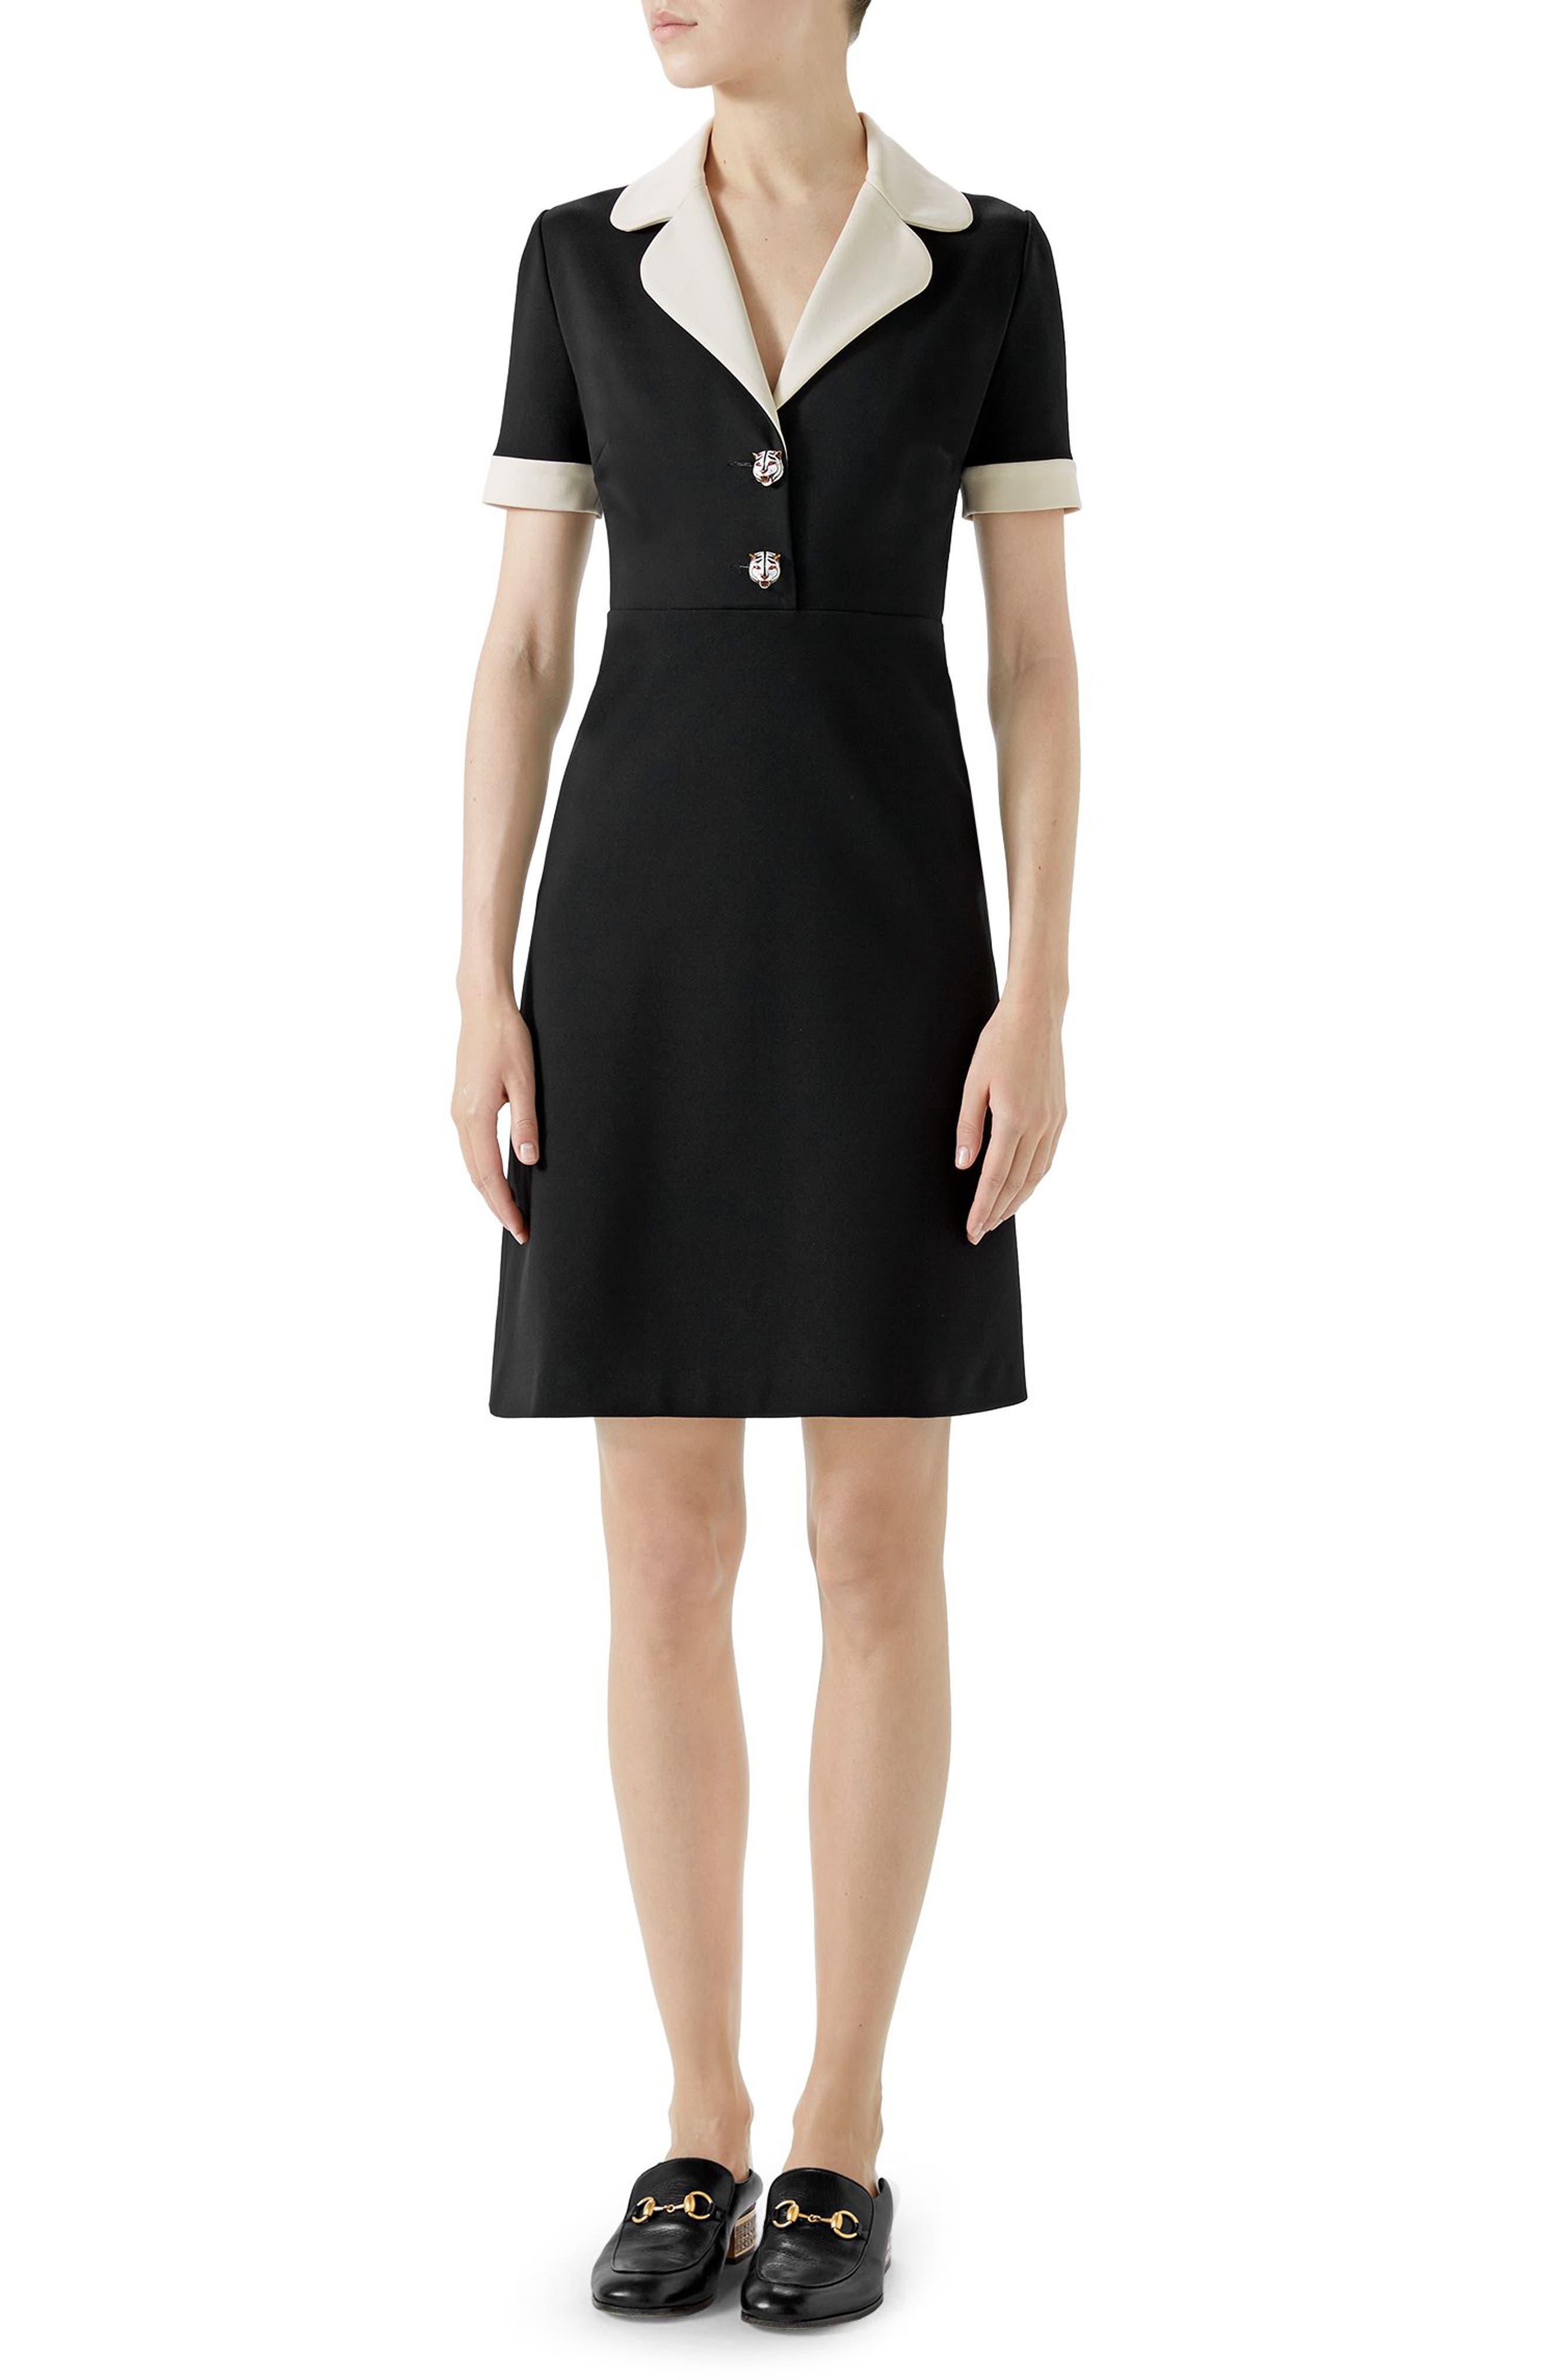 Tiger Button Contrast Trim Jersey Dress,                             Main thumbnail 1, color,                             BLACK/ ALMOND FLOWER